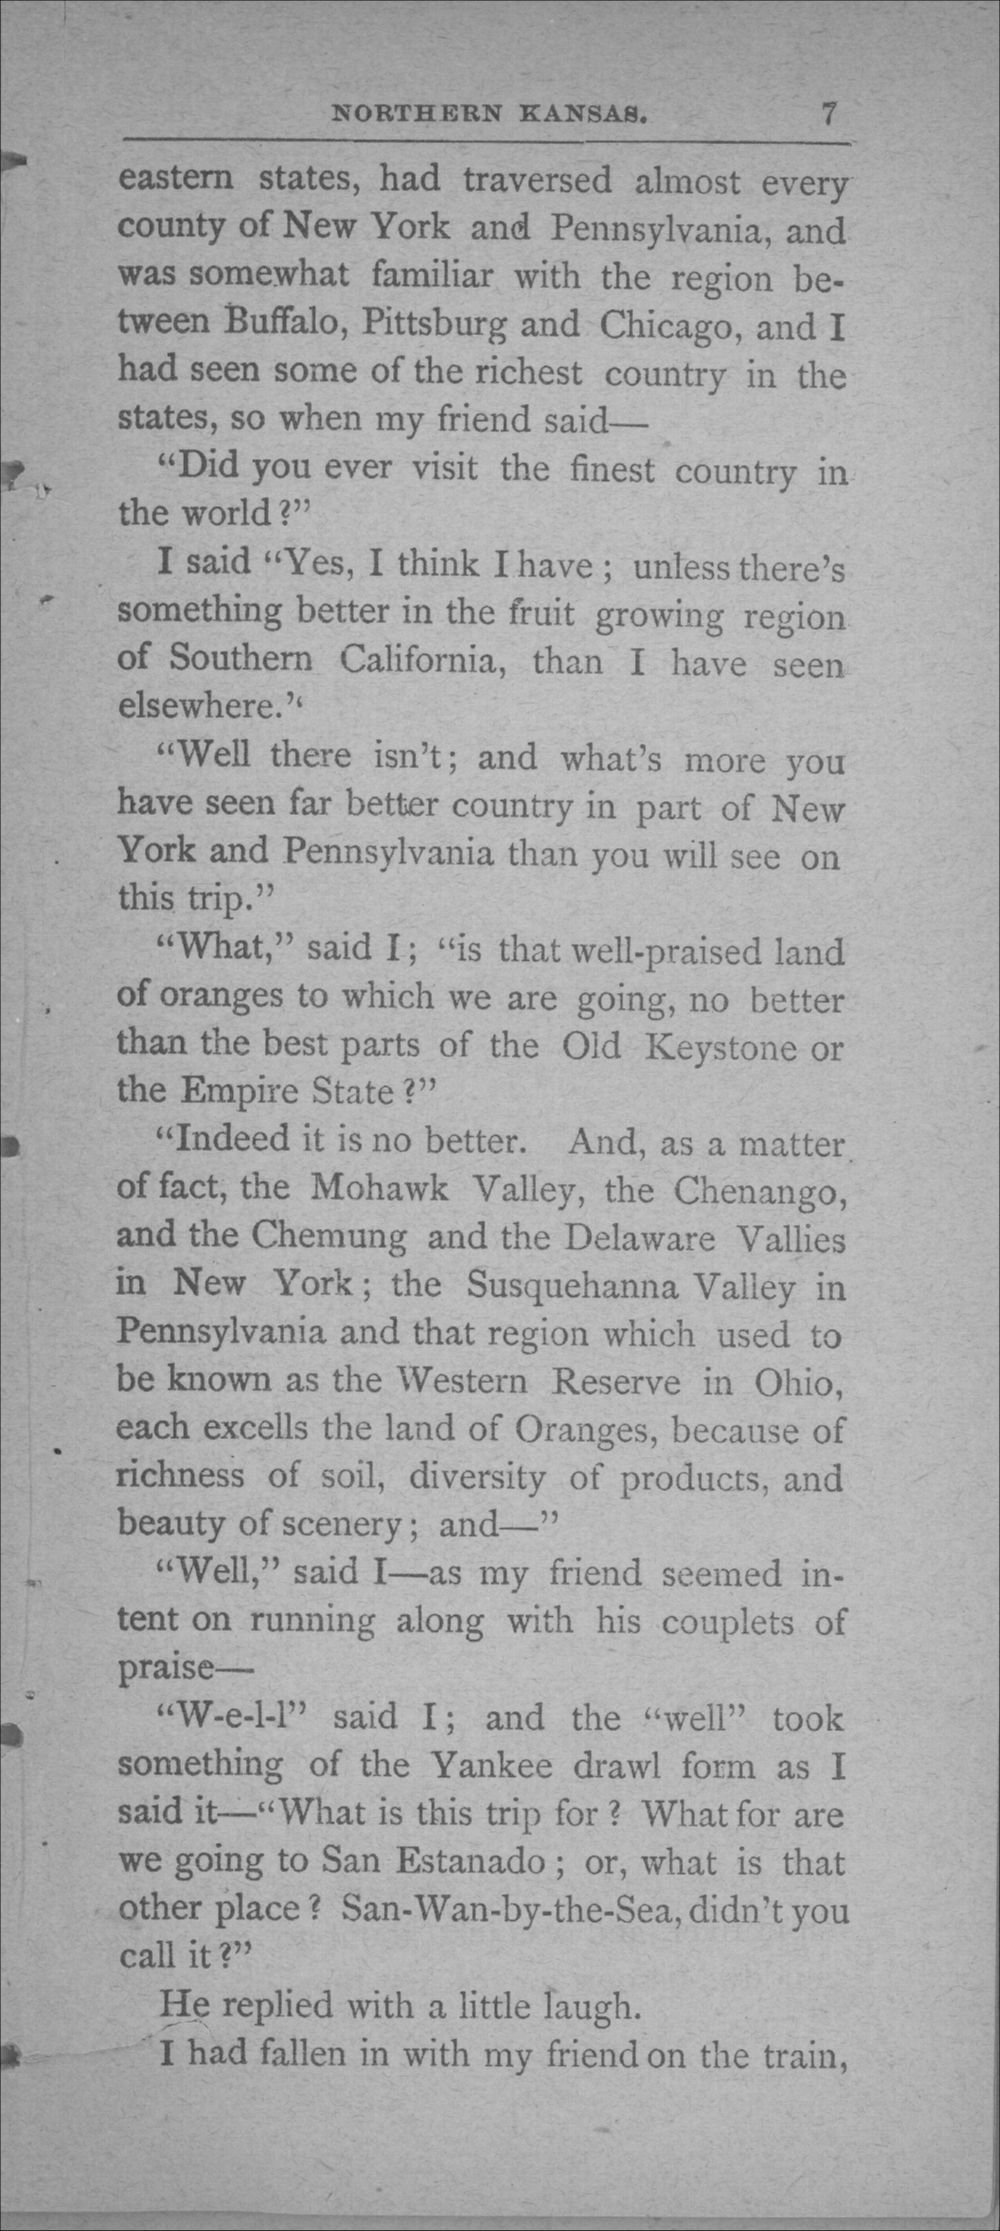 The great northwest! - 7